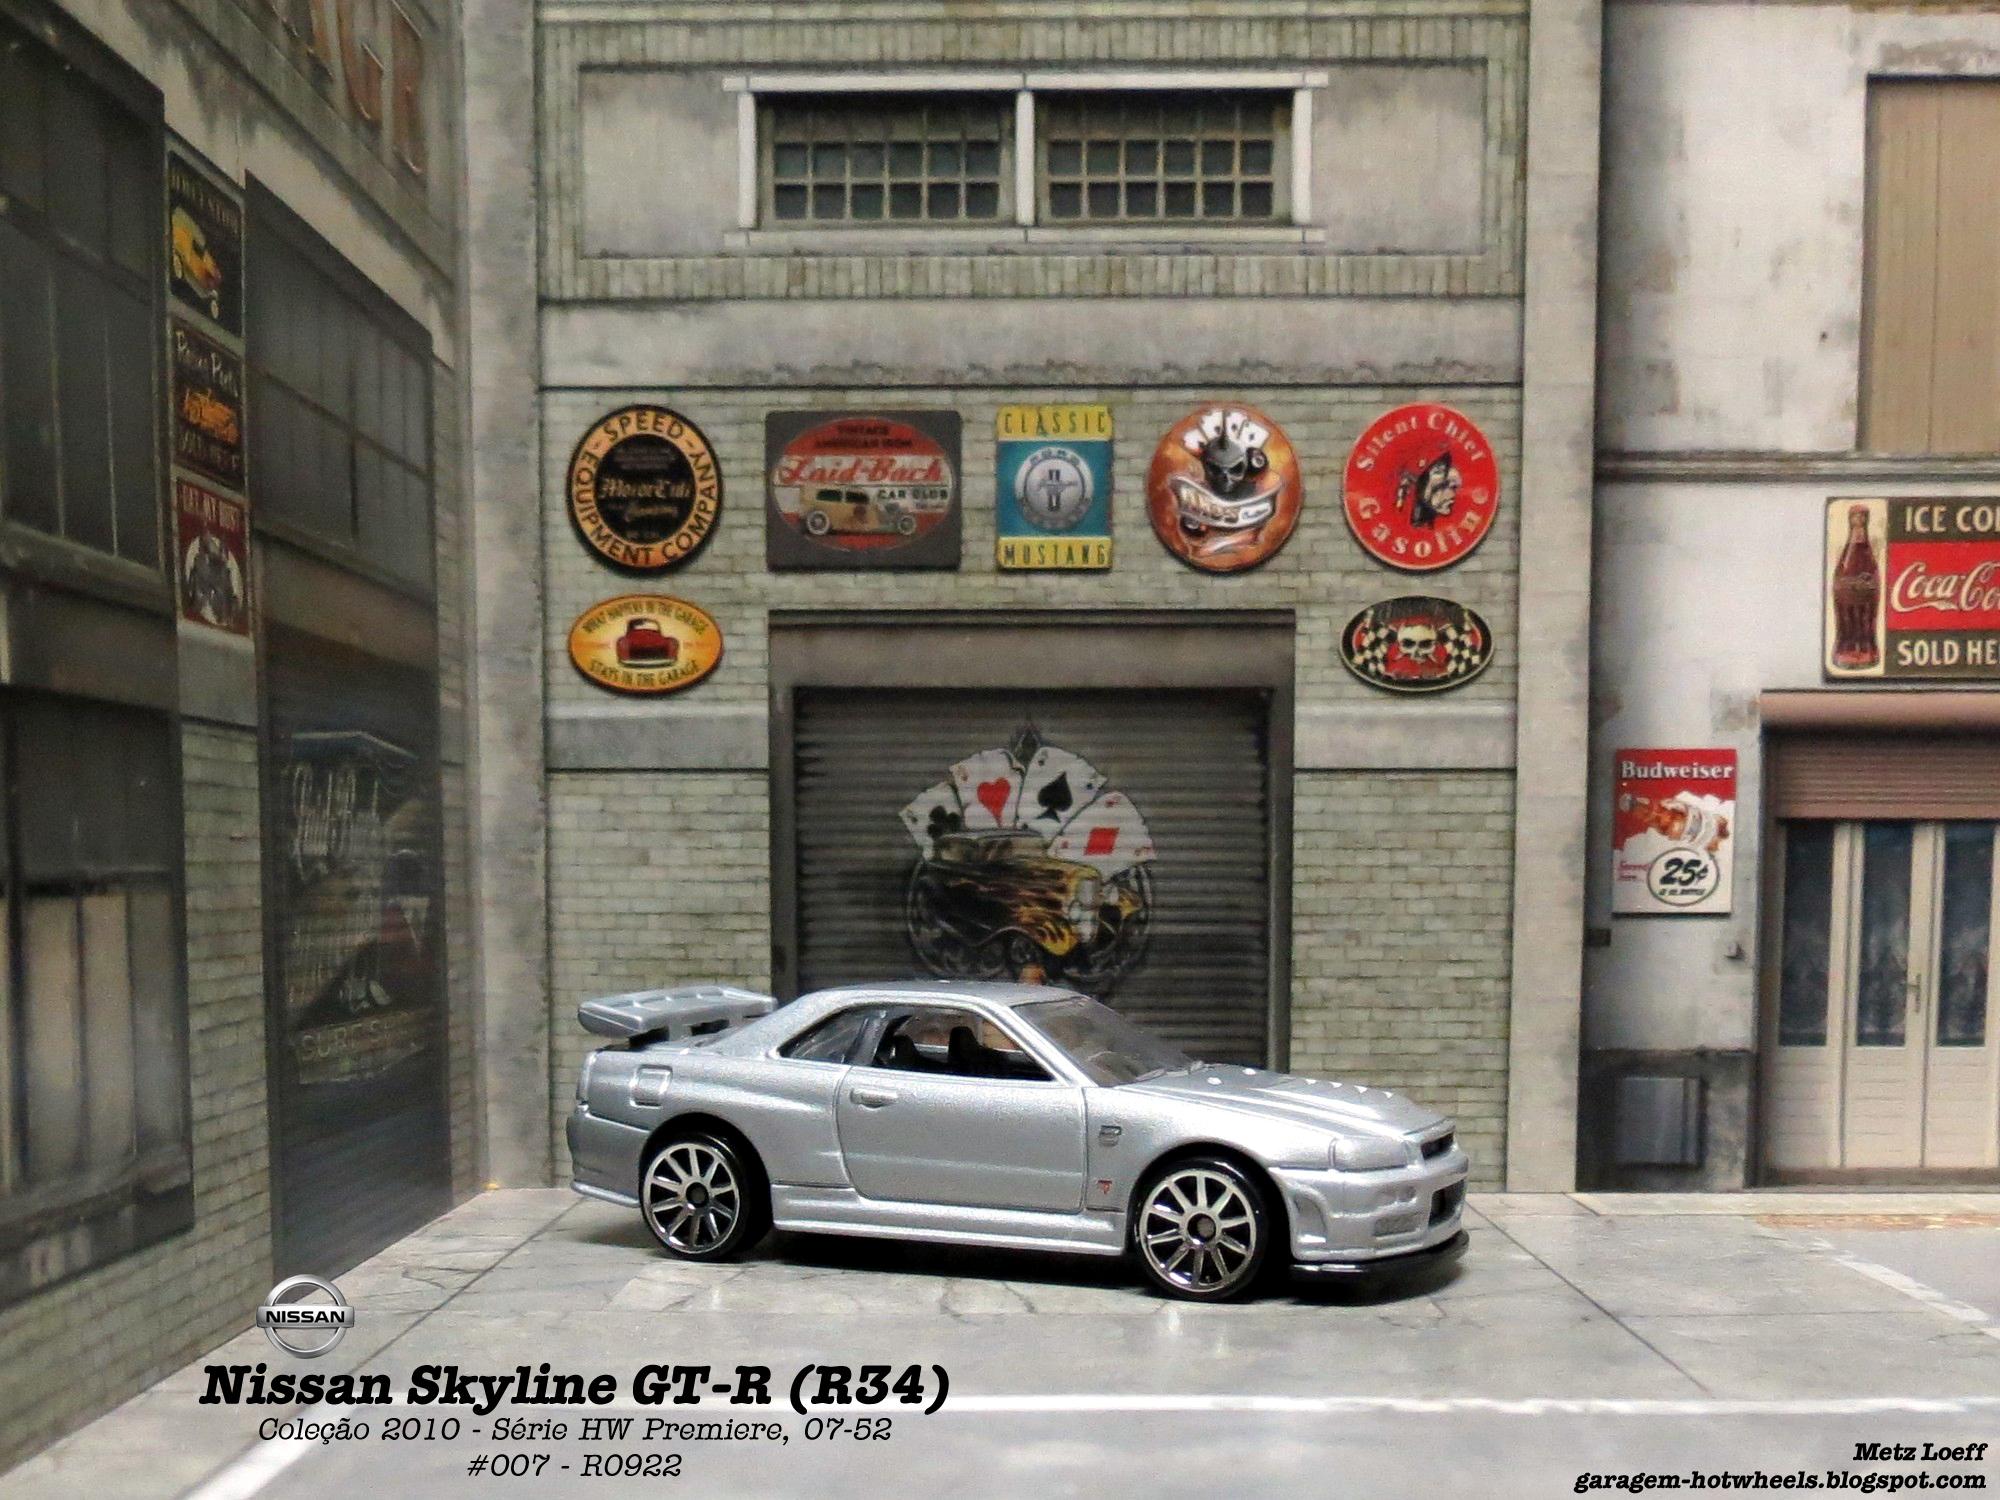 Nissan Skyline Gtr R34 Wiki Nissan Skyline gt r R34 01